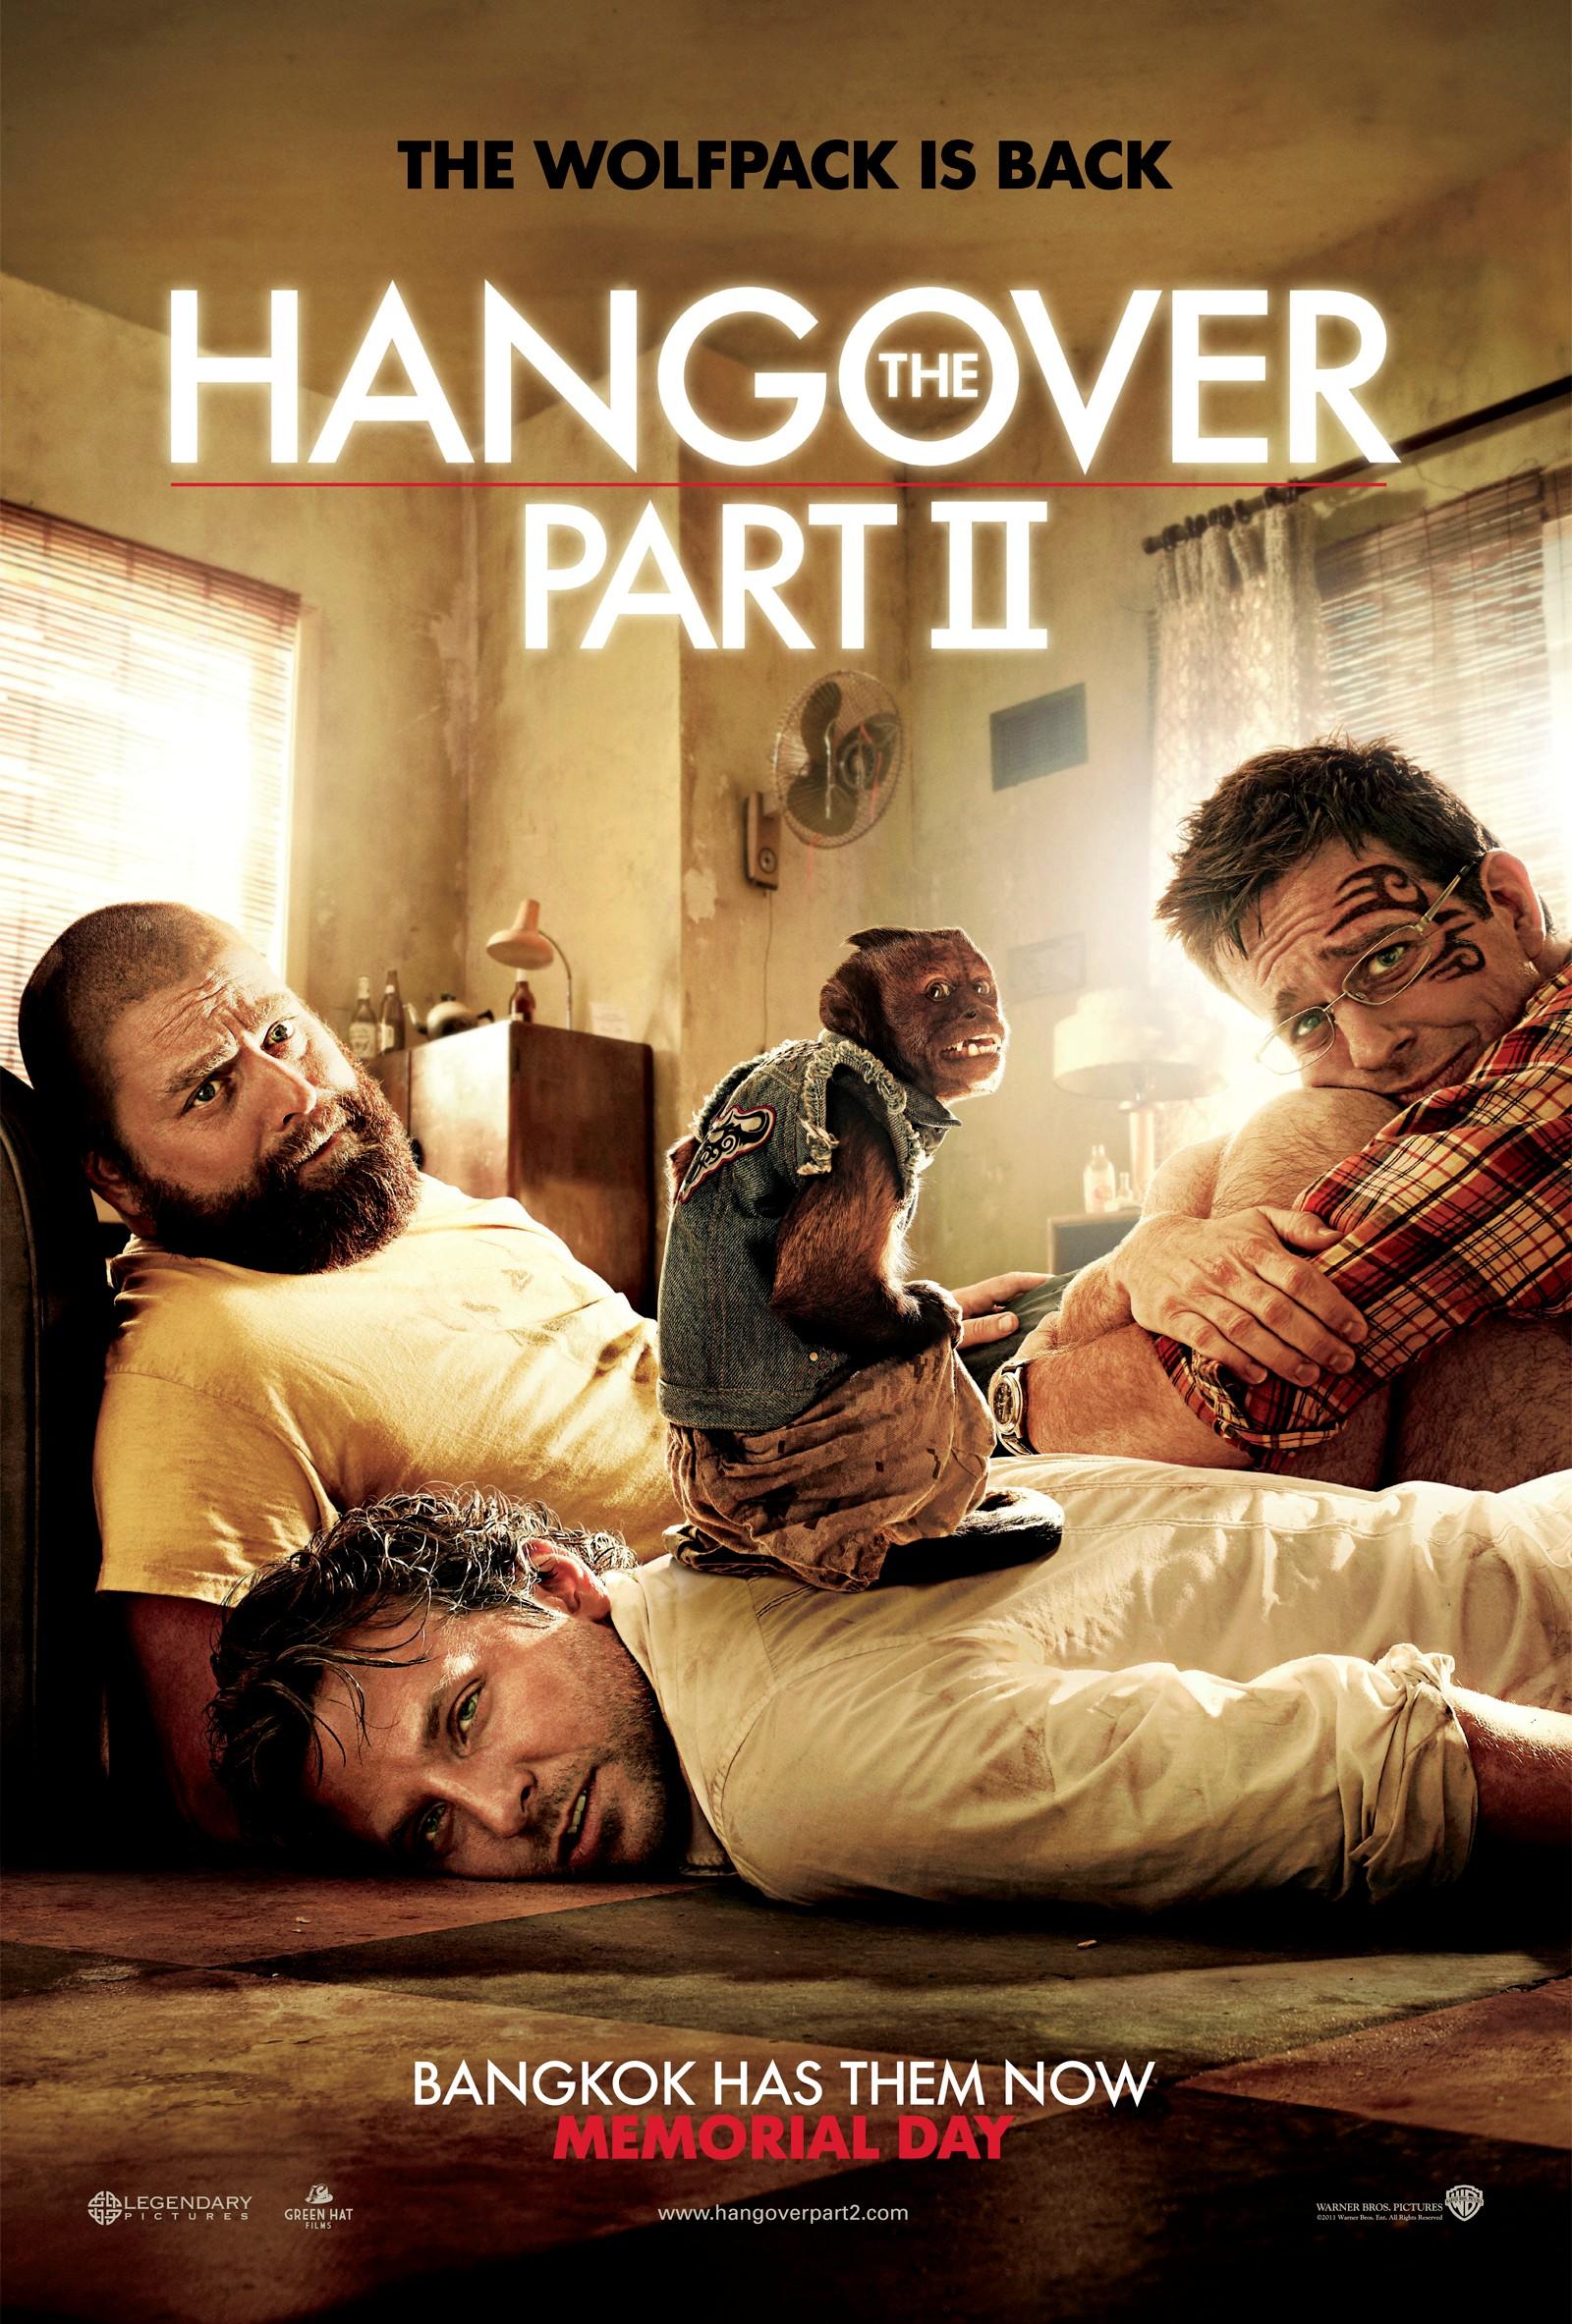 The hangover part ii 2017 brrip 720p x264 mgb